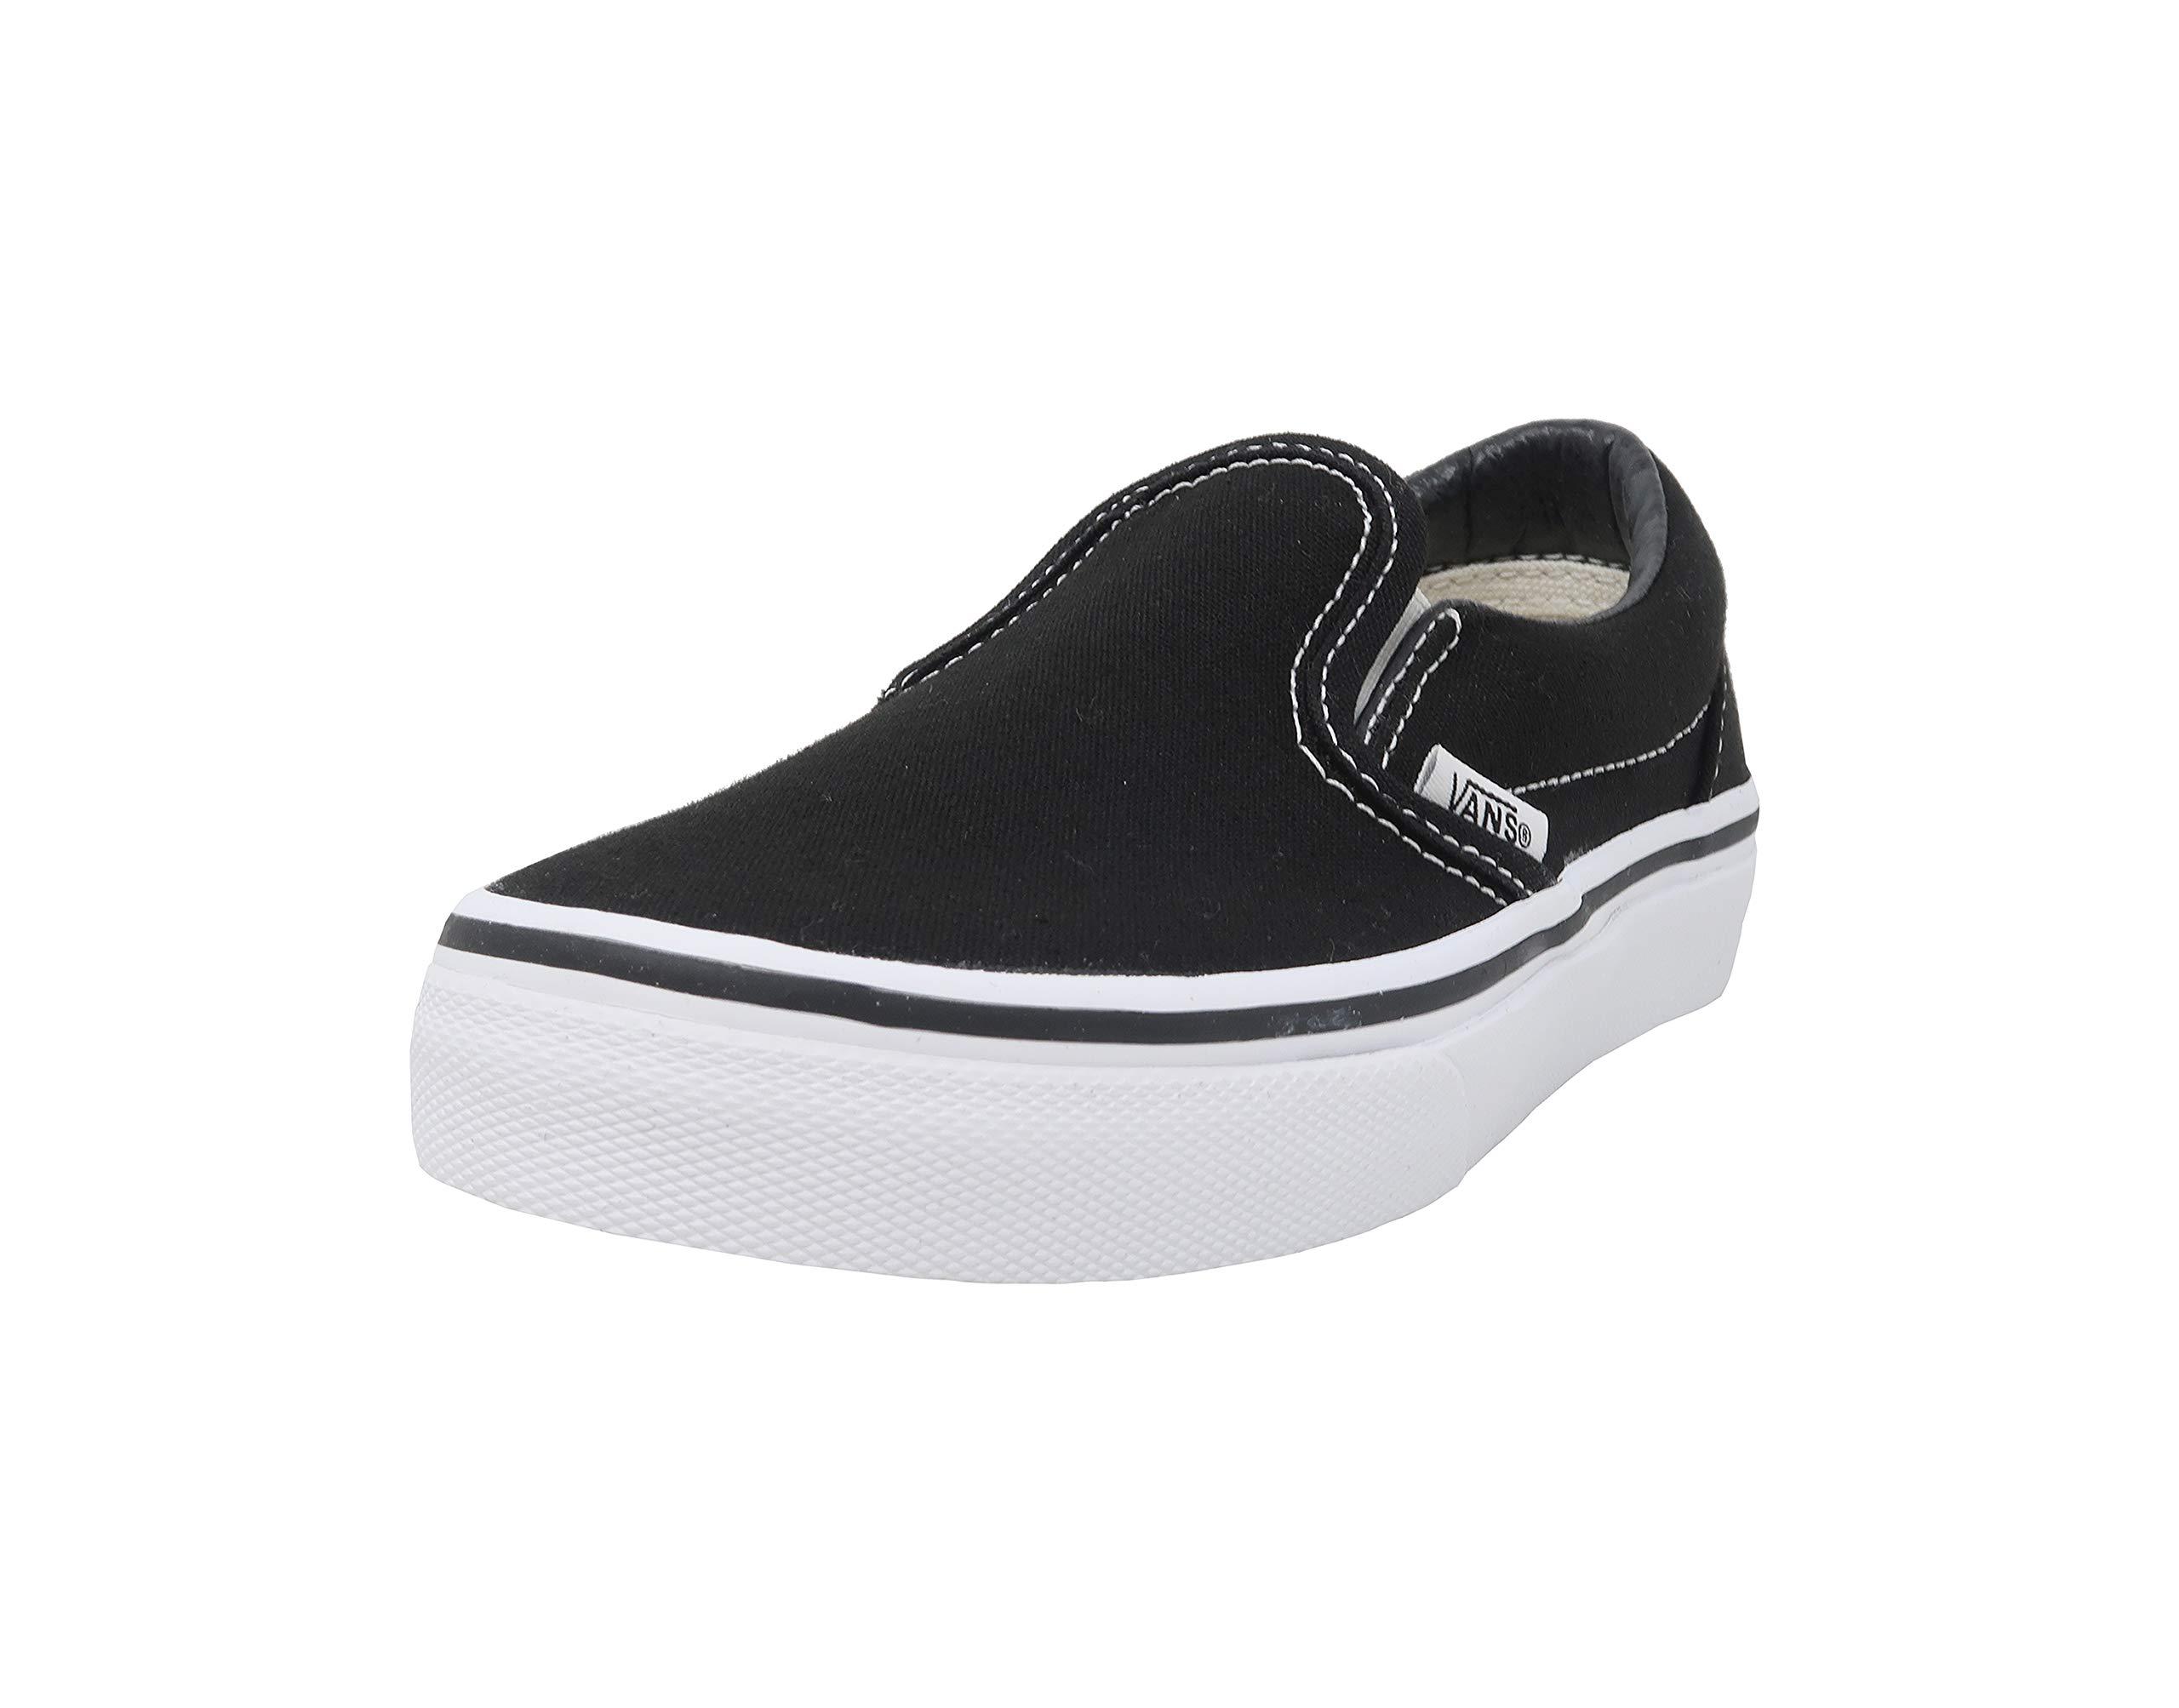 Vans Kids Classic Slip-On (Little Big Kid), Black/True White, 1 M